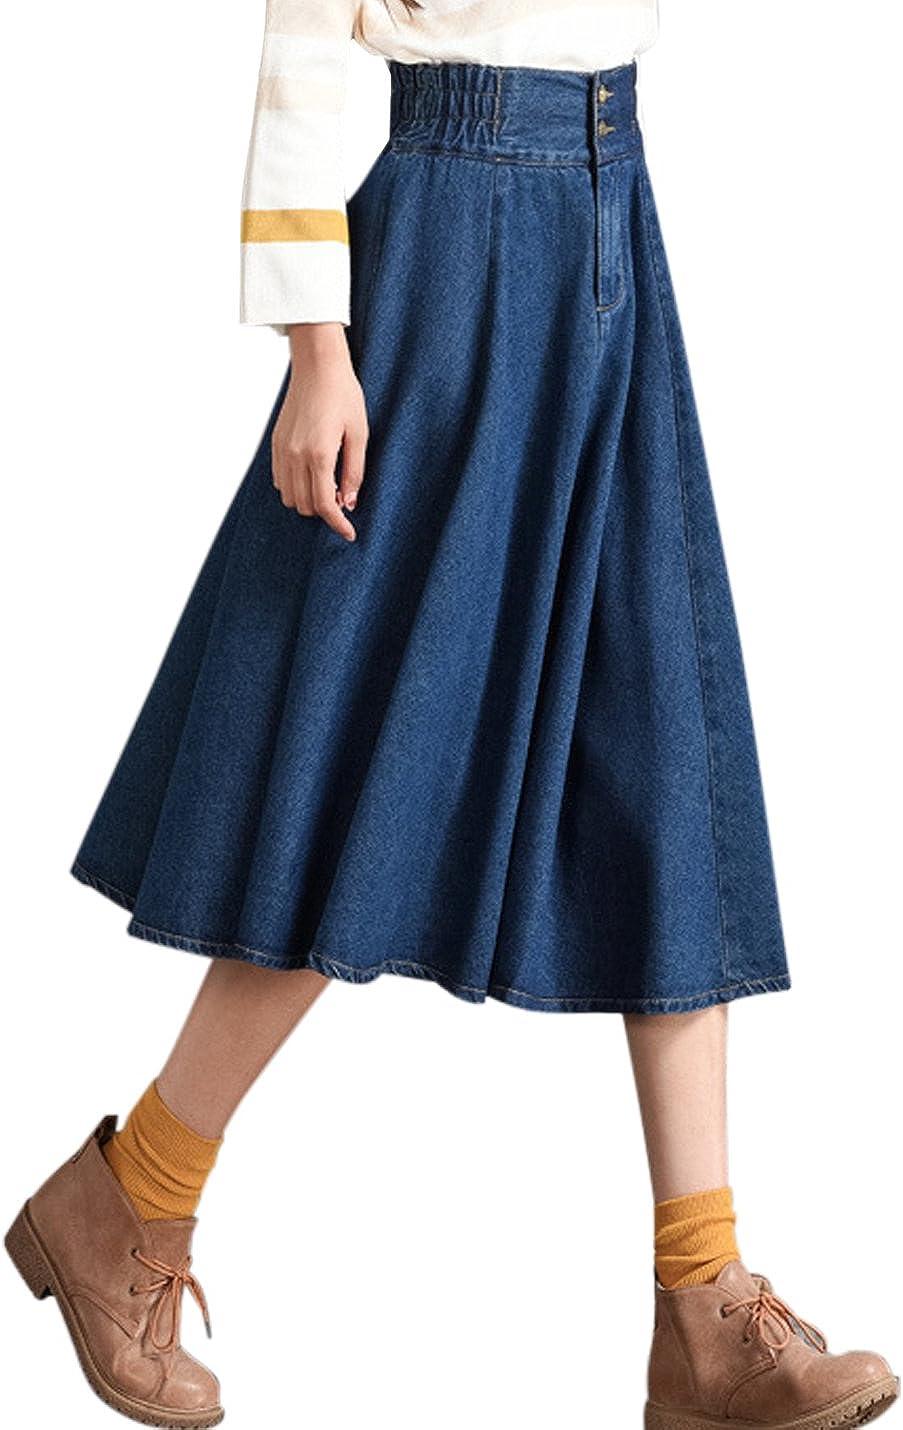 Uaneo Women's Casual High Elastic Waist Pleated A Line Below Knee Denim Skirts (Blue, XX-Large)